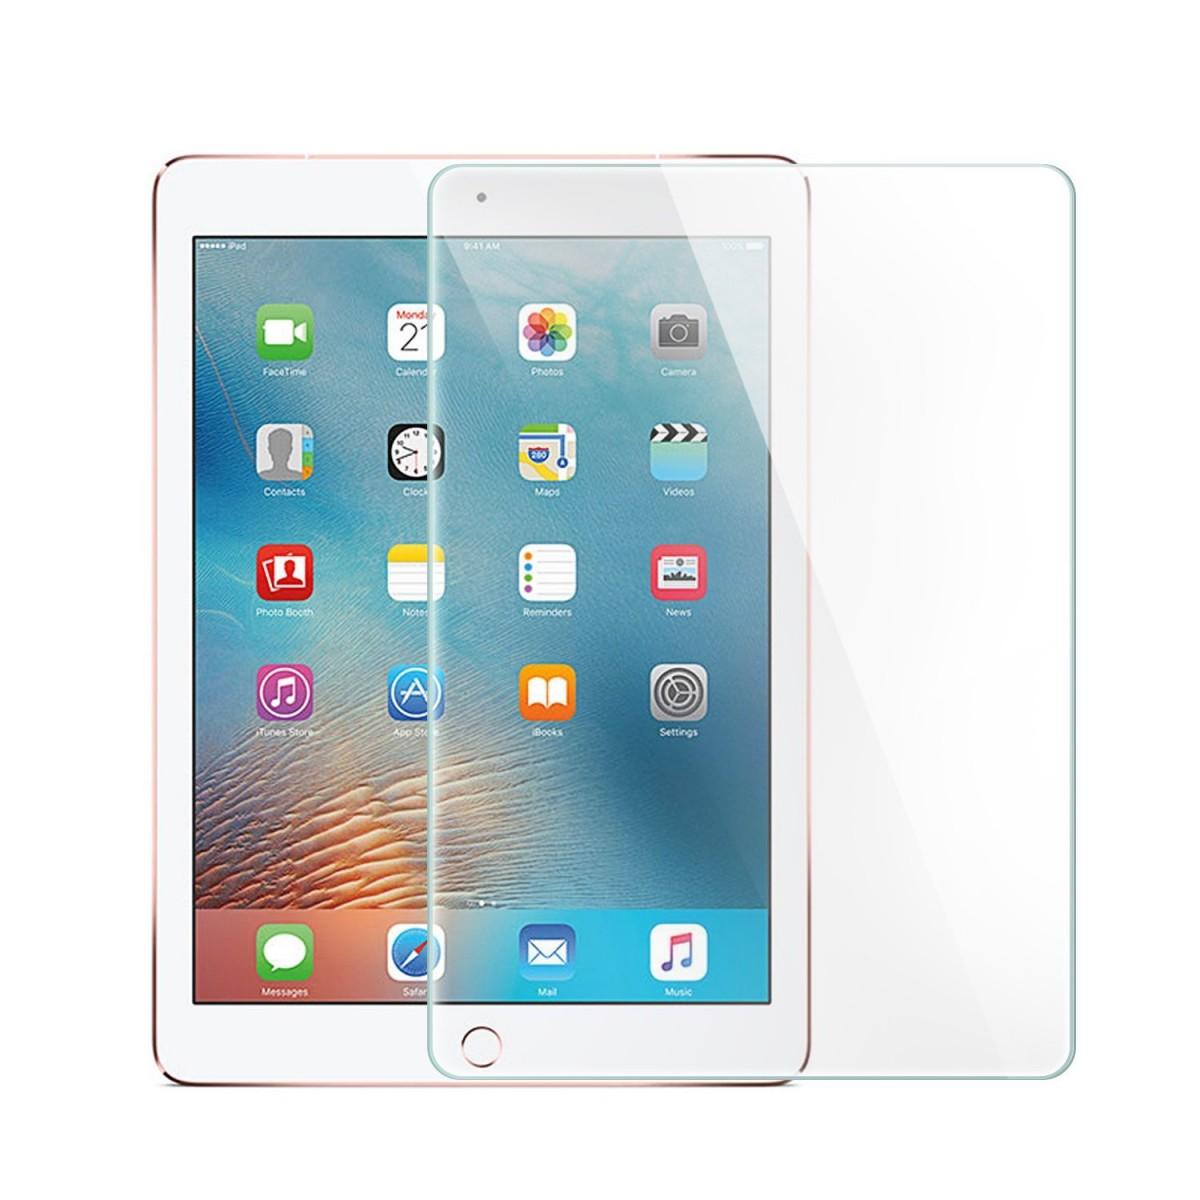 "Ochranné tvrzené sklo FIXED pro Apple iPad (2018)/ iPad (2017)/Air/Air 2/Pro 9,7"", 0.33 mm (FIXG-269-033)"